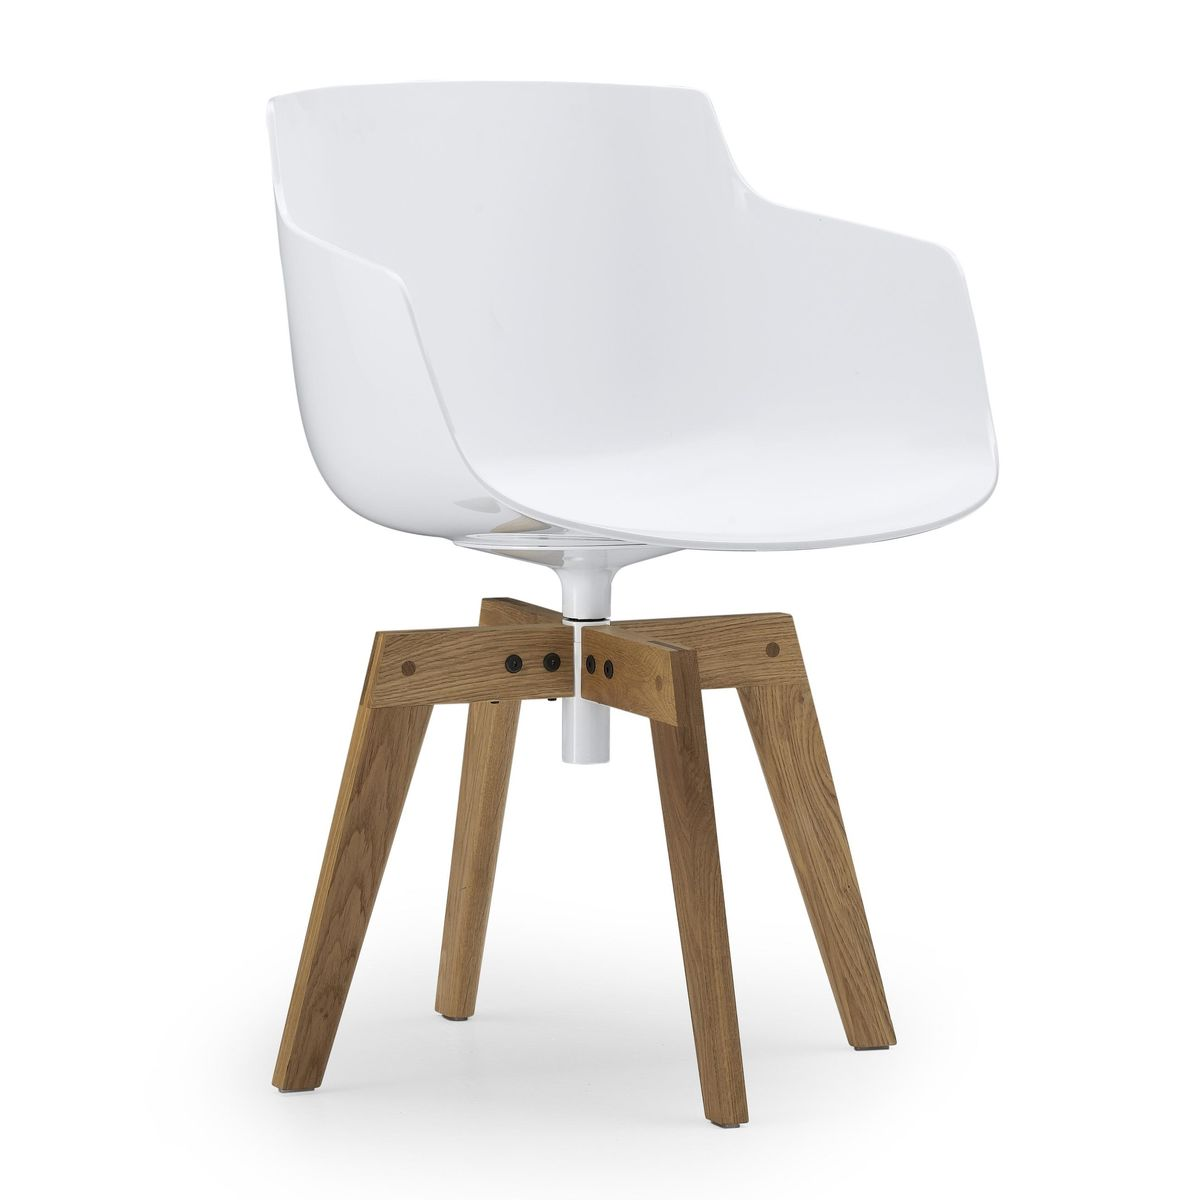 flow slim armlehnstuhl f e in eiche mdf italia. Black Bedroom Furniture Sets. Home Design Ideas